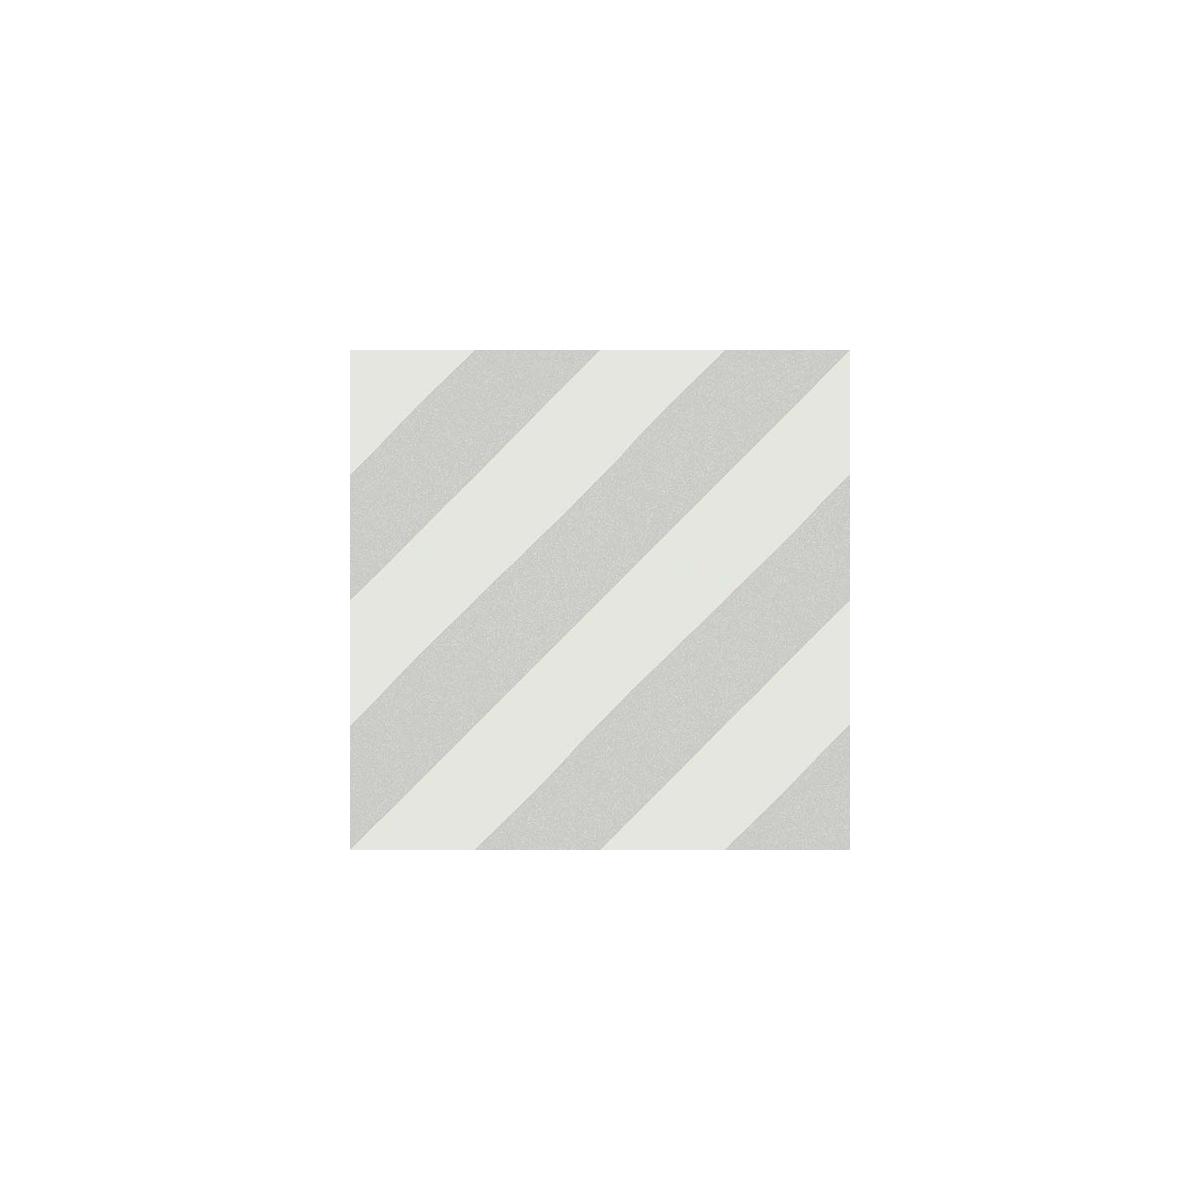 Goroka Gris (m2) - Pavimento hidráulico Porcelánico antideslizante